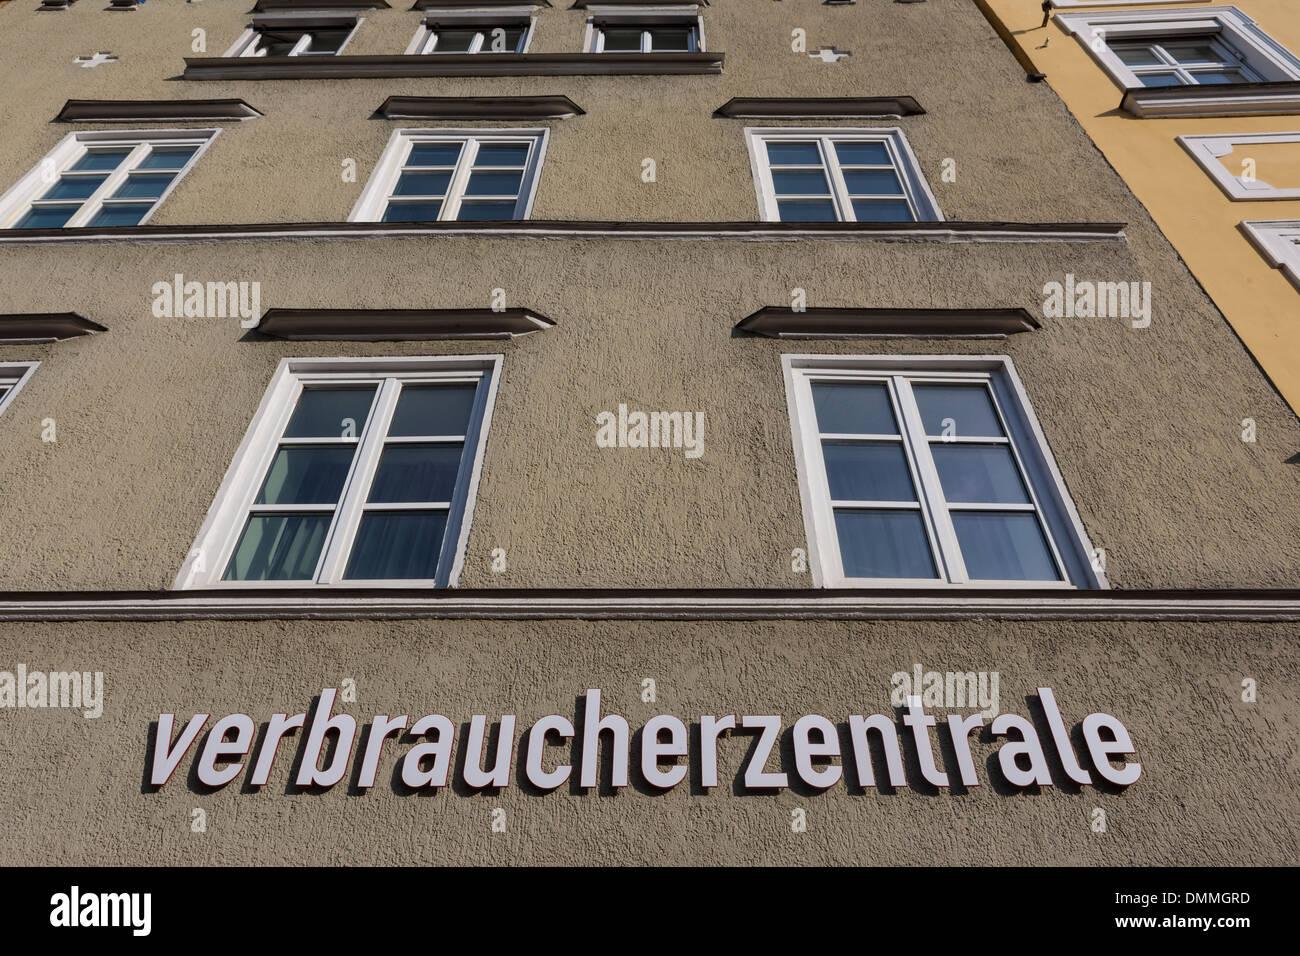 Germany, Bavaria, Landshut, consumer advice centre - Stock Image